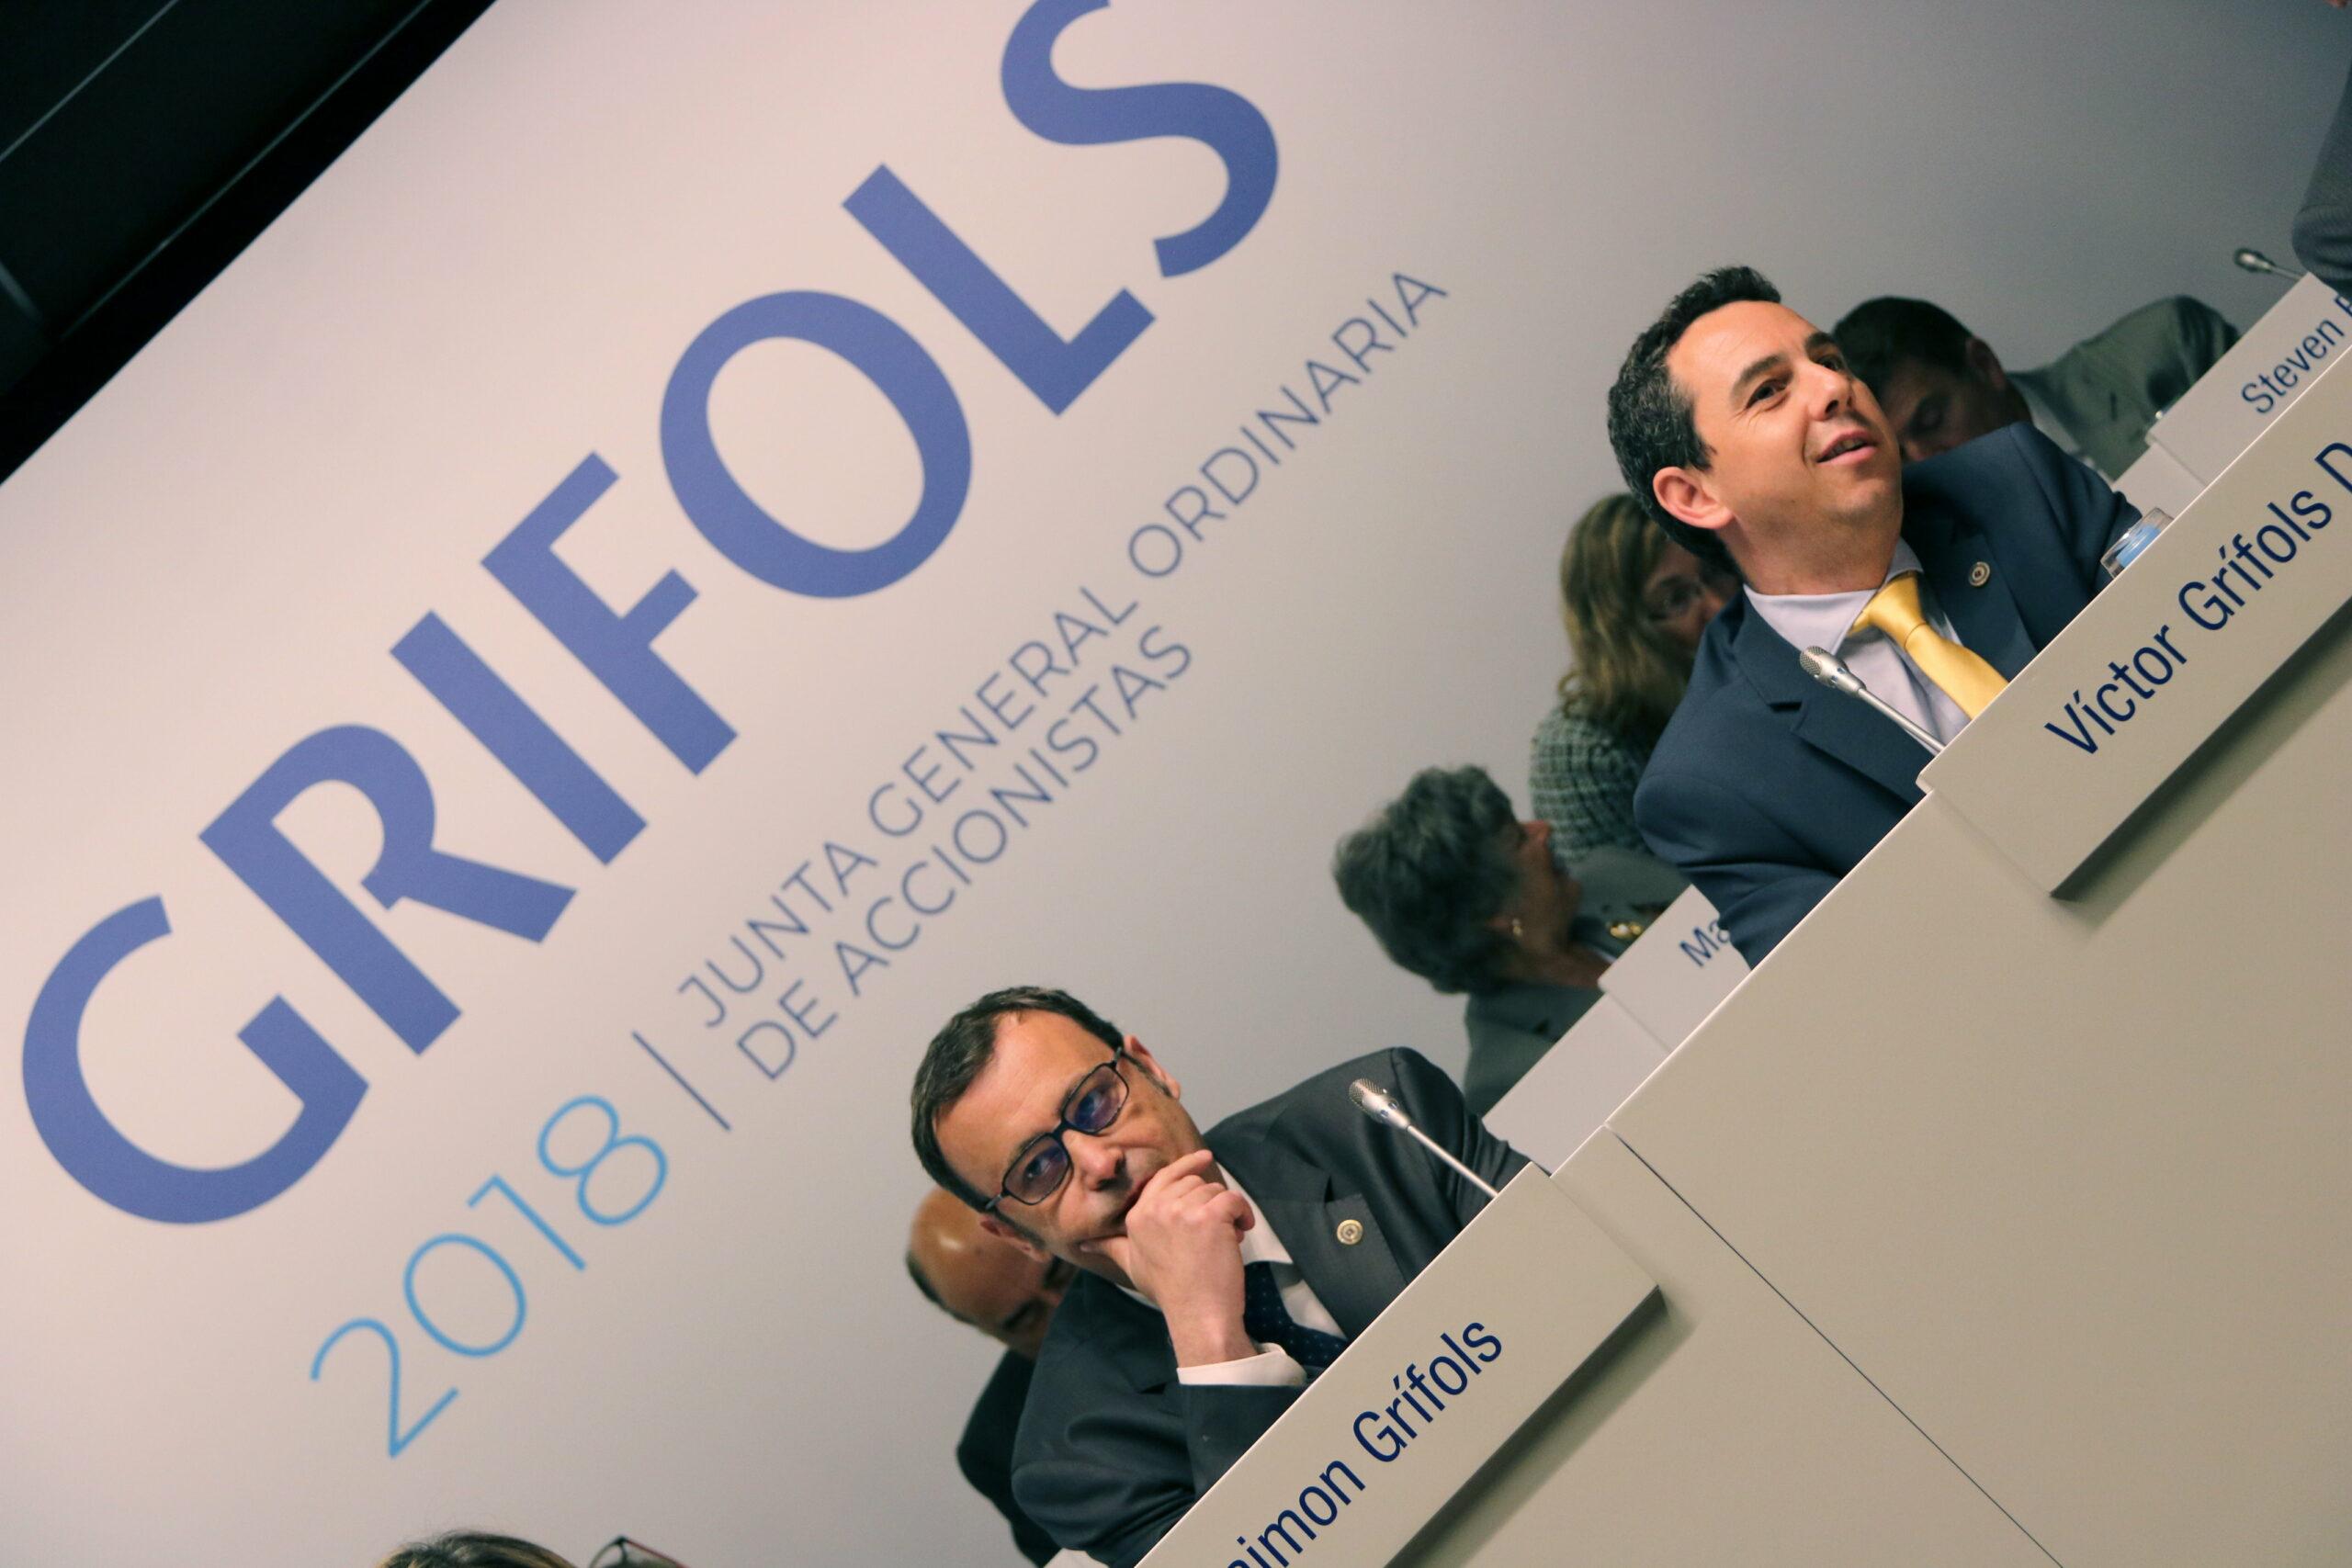 Els dos consellers delegats de Grifols, Raimon Grífols i Víctor Grífols Déu | ACN